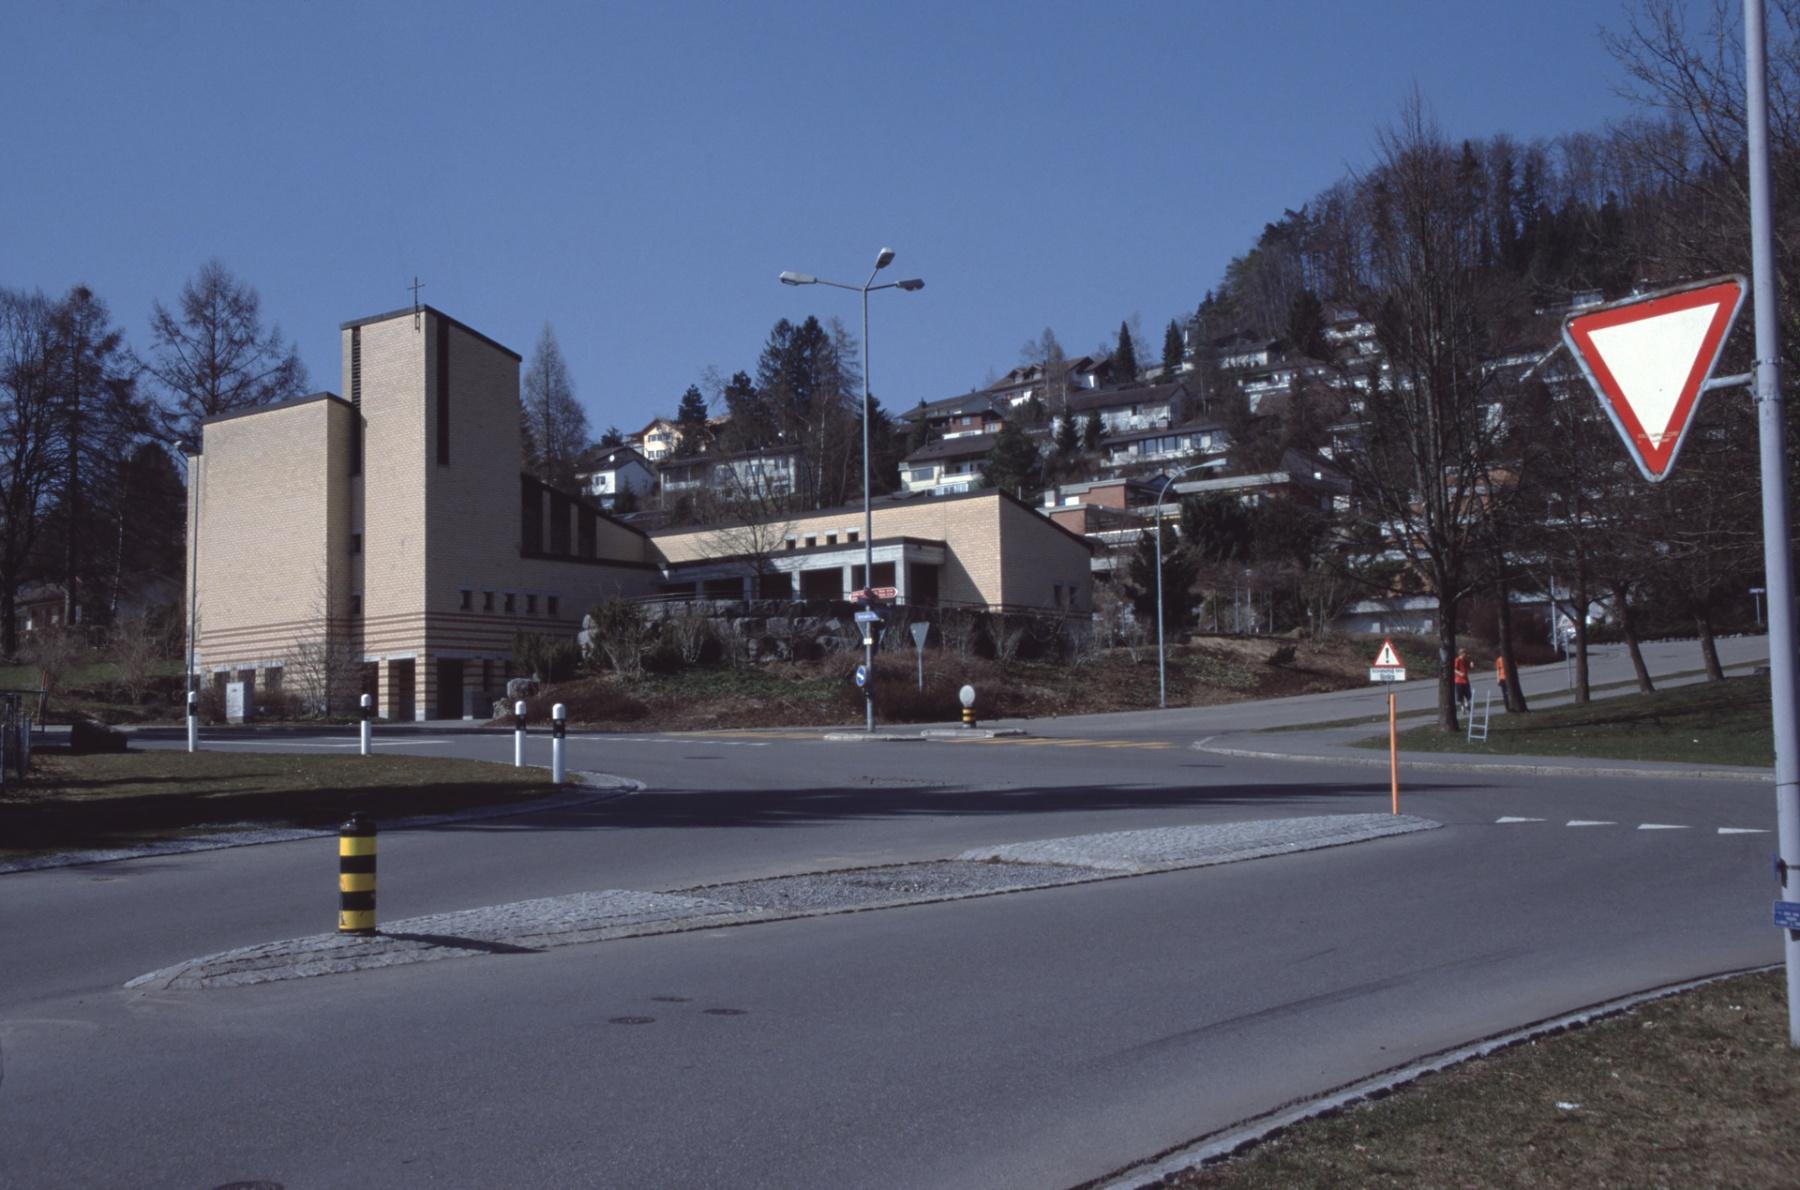 Lettenkreuzung mit kath. Kirche